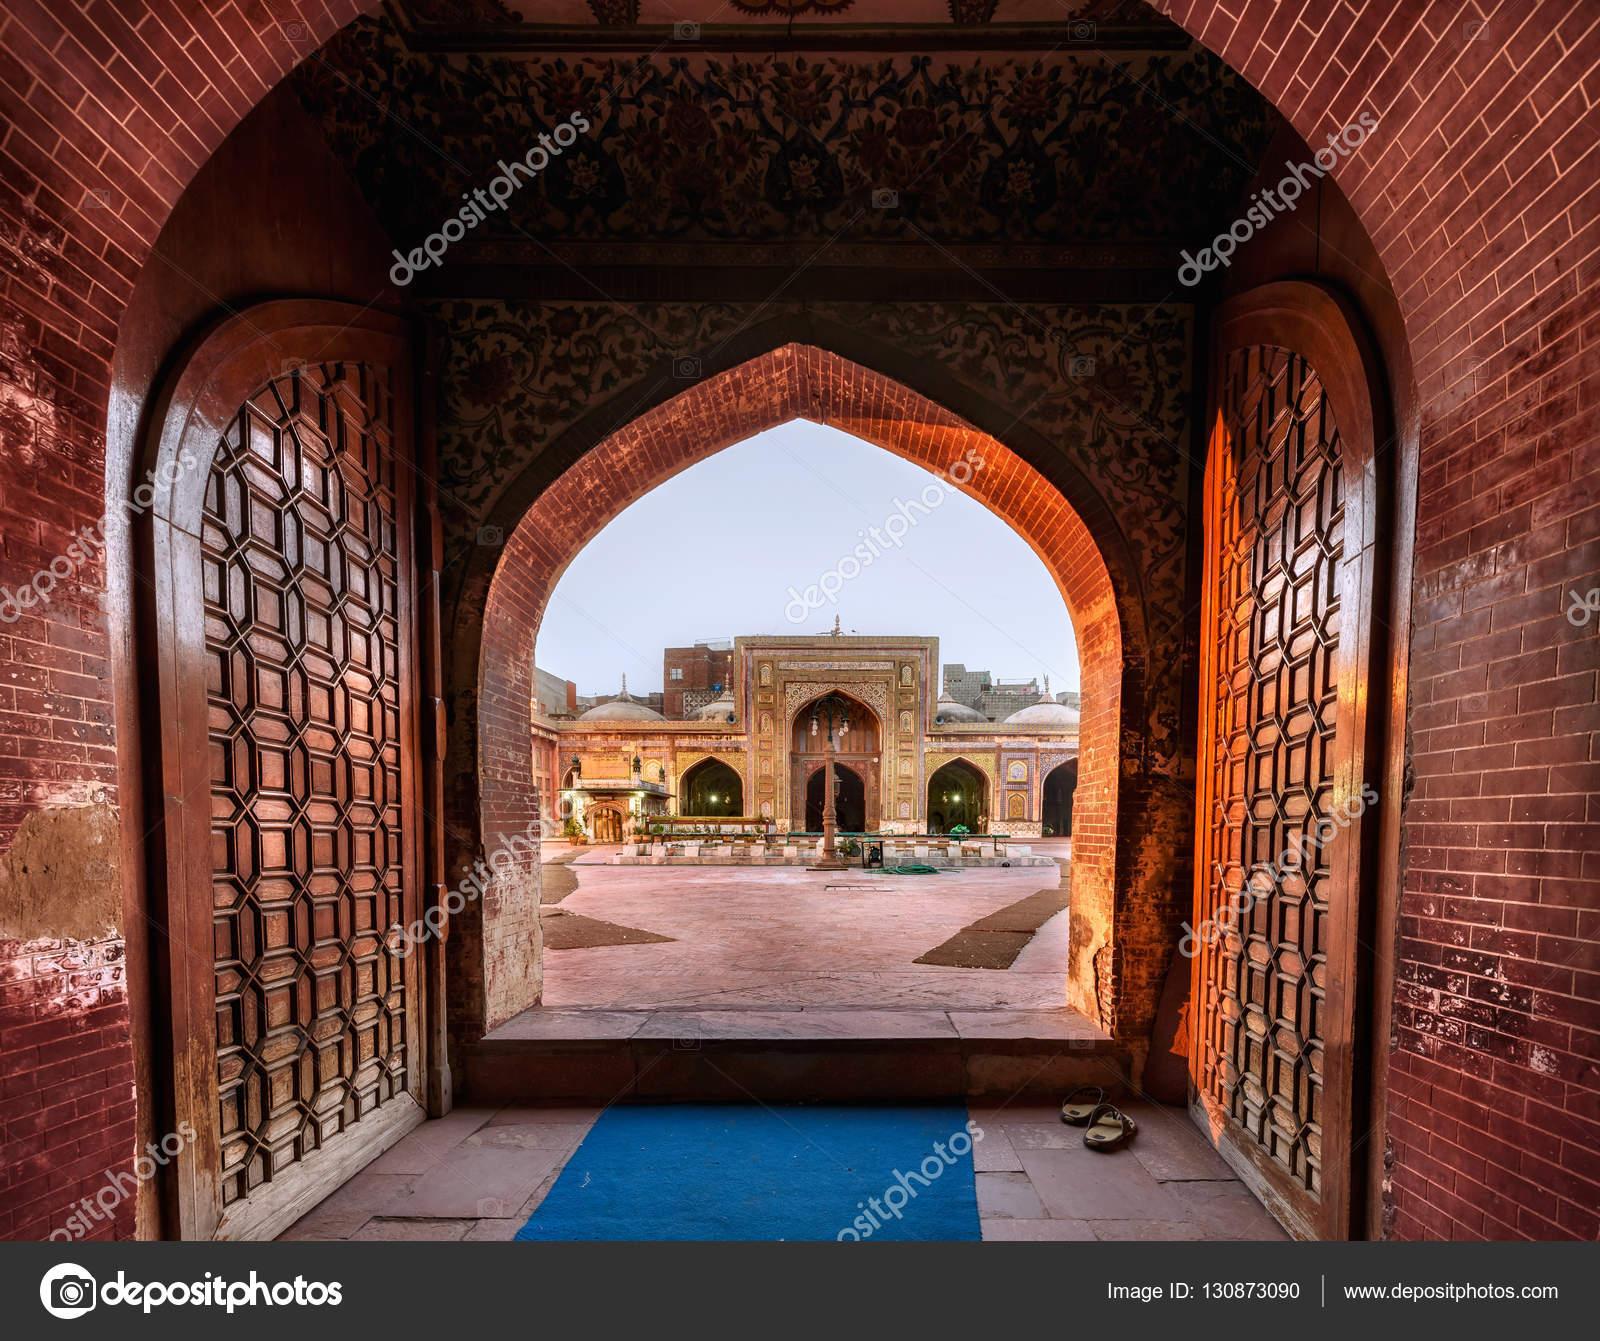 Entrance door Masjid Wazir khan Lahore Pakistan \u2014 Stock Photo & Entrance door Masjid Wazir khan Lahore Pakistan \u2014 Stock Photo ...